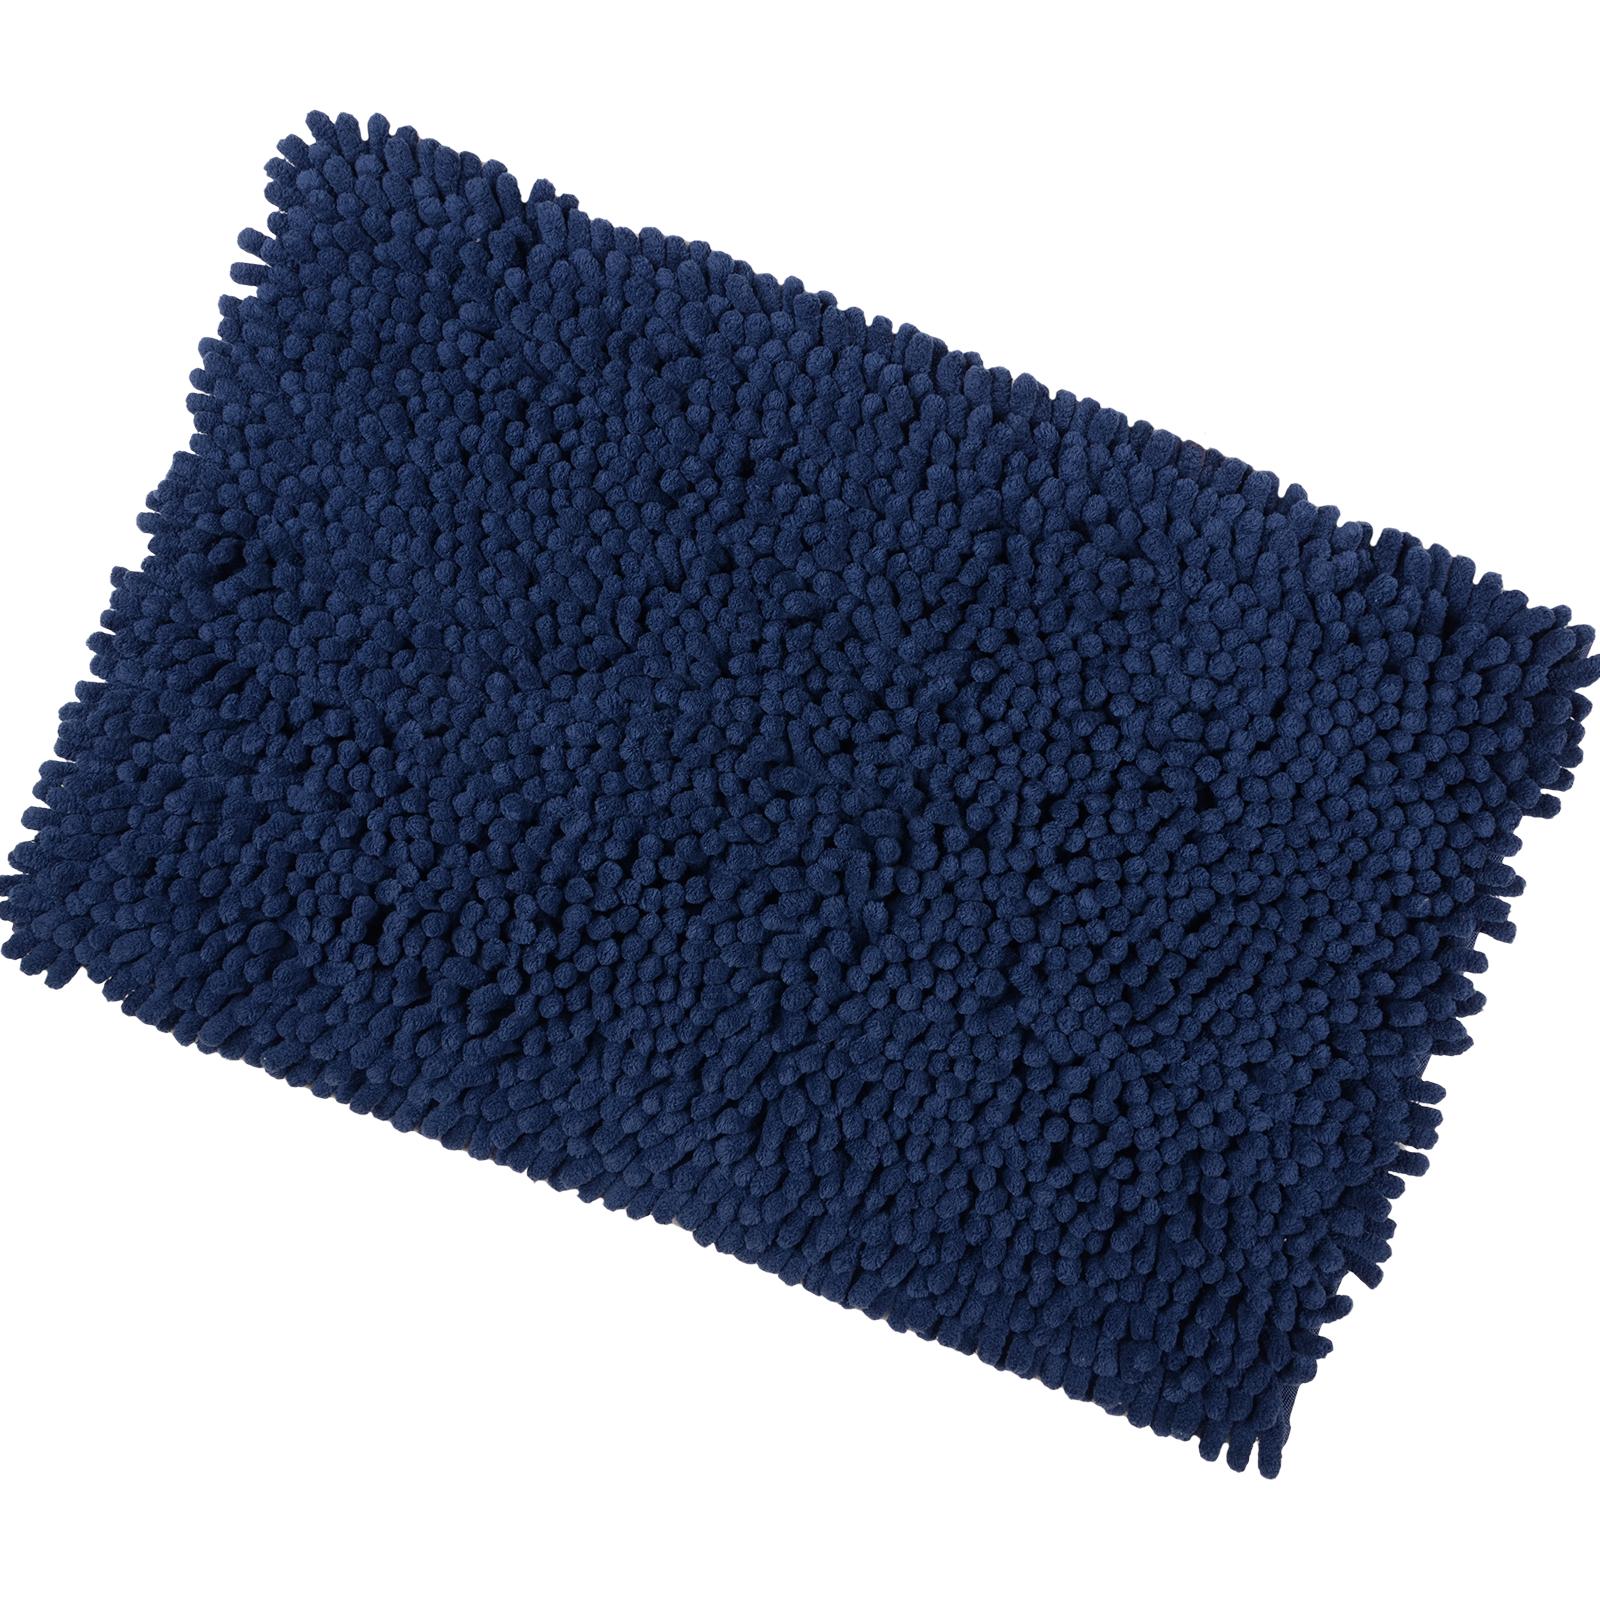 Shaggy Microfibre Bathroom Shower Bath Mat Rug Non-Slip